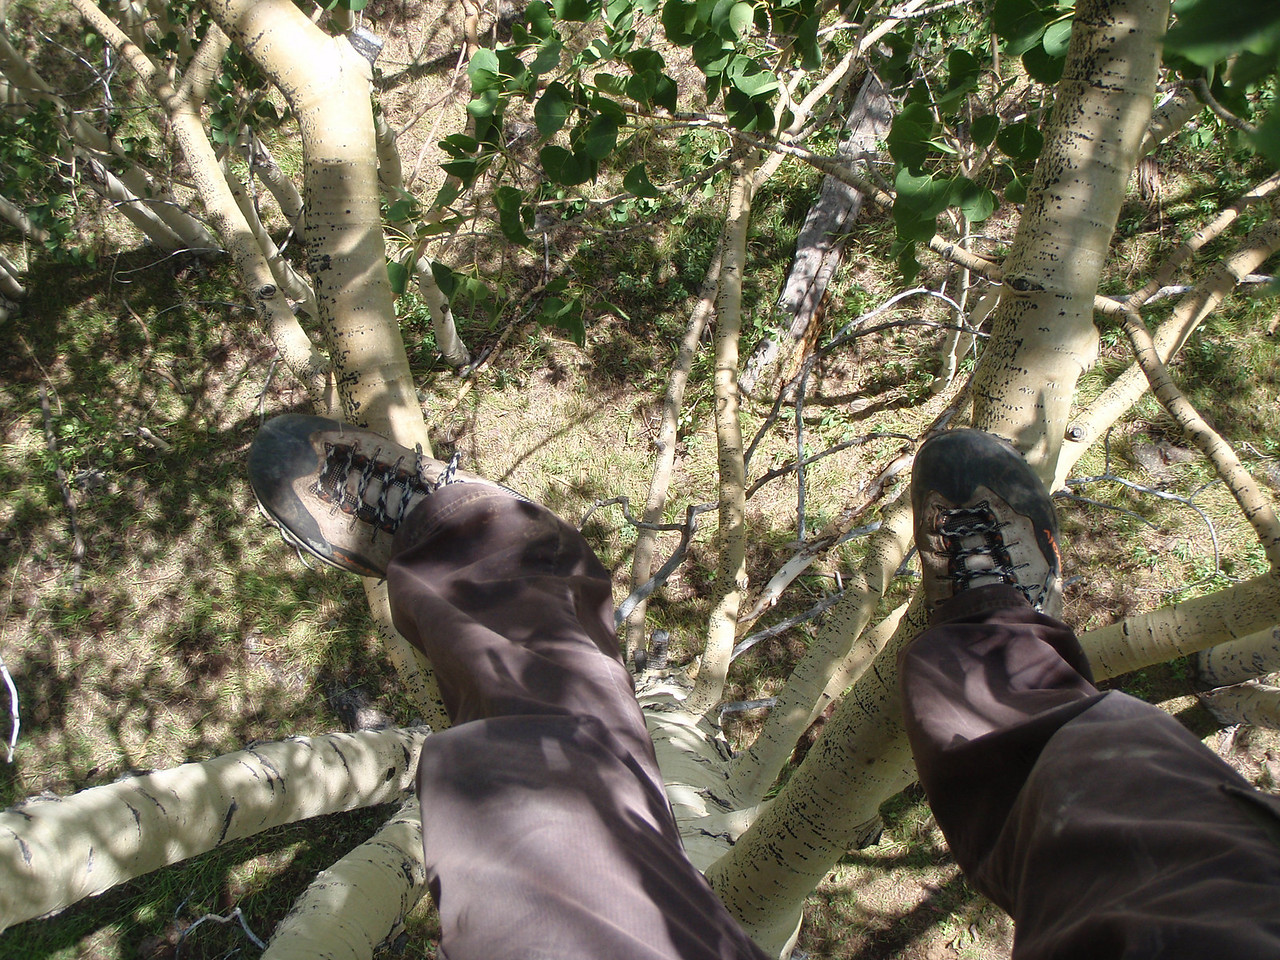 high up in an Aspen tree